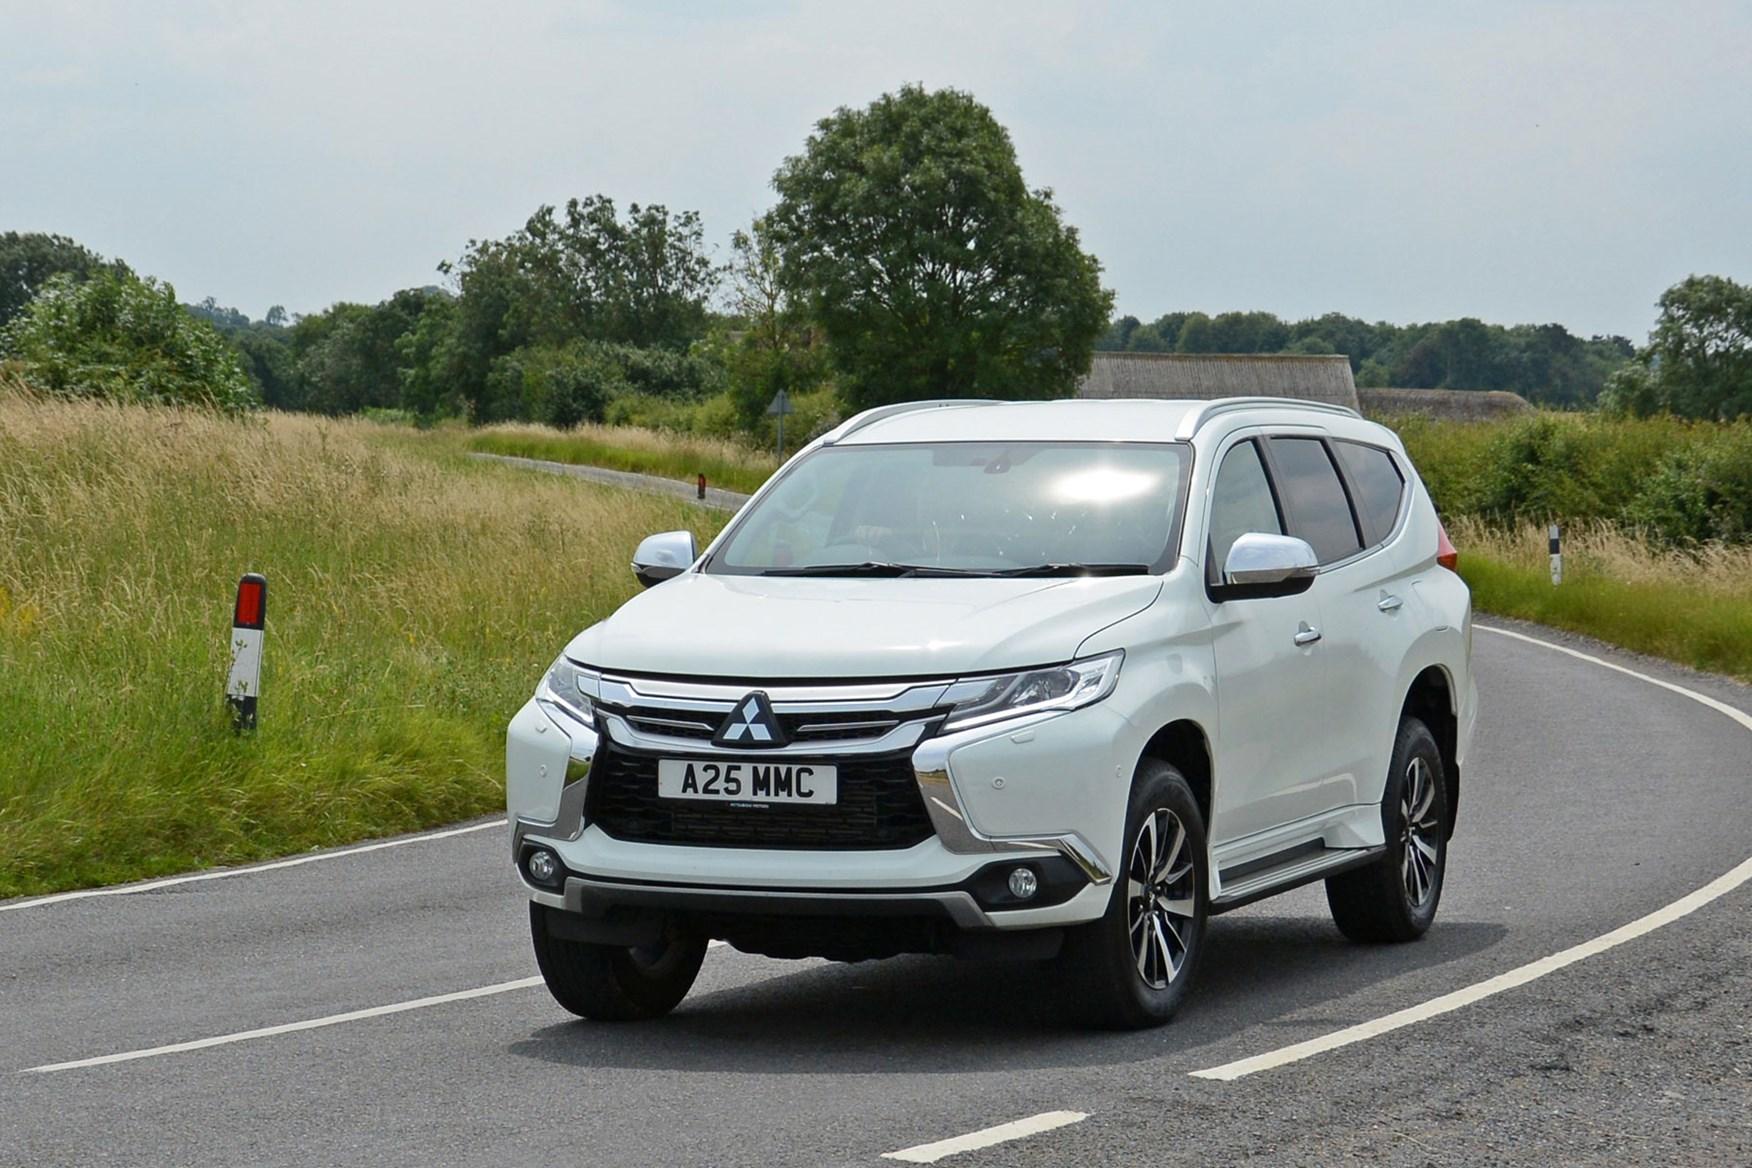 Mitsubishi Shogun Sport Commercial 4x4 van review - front view, white, driving round corner